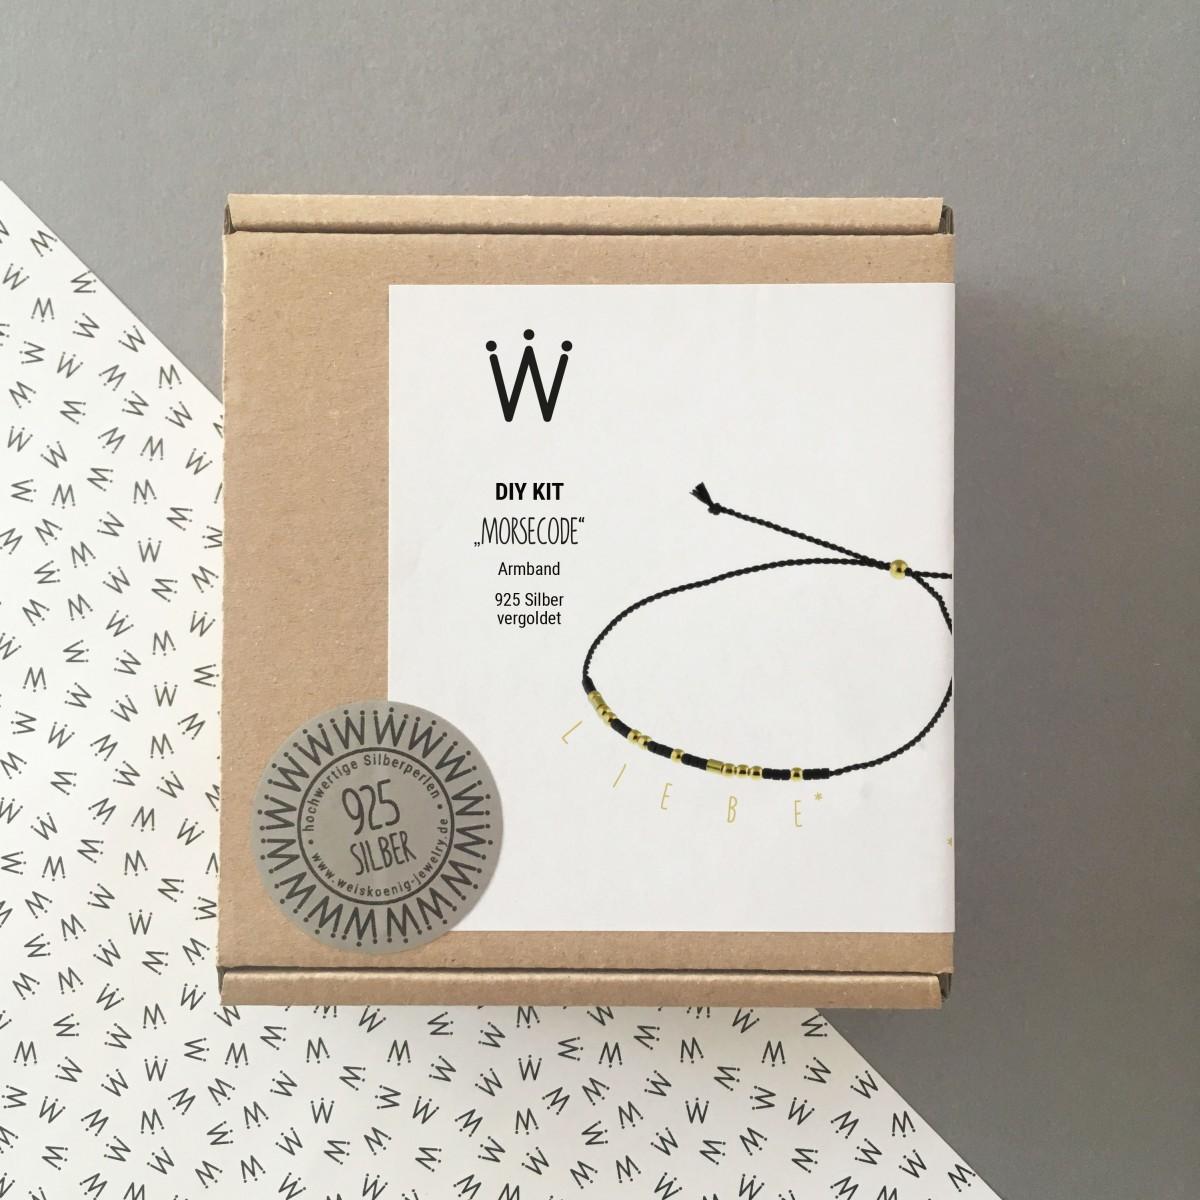 "DIY KIT ""MORSECODE"" Armband 925er Silber vergoldet – Weiskönig Jewelry"